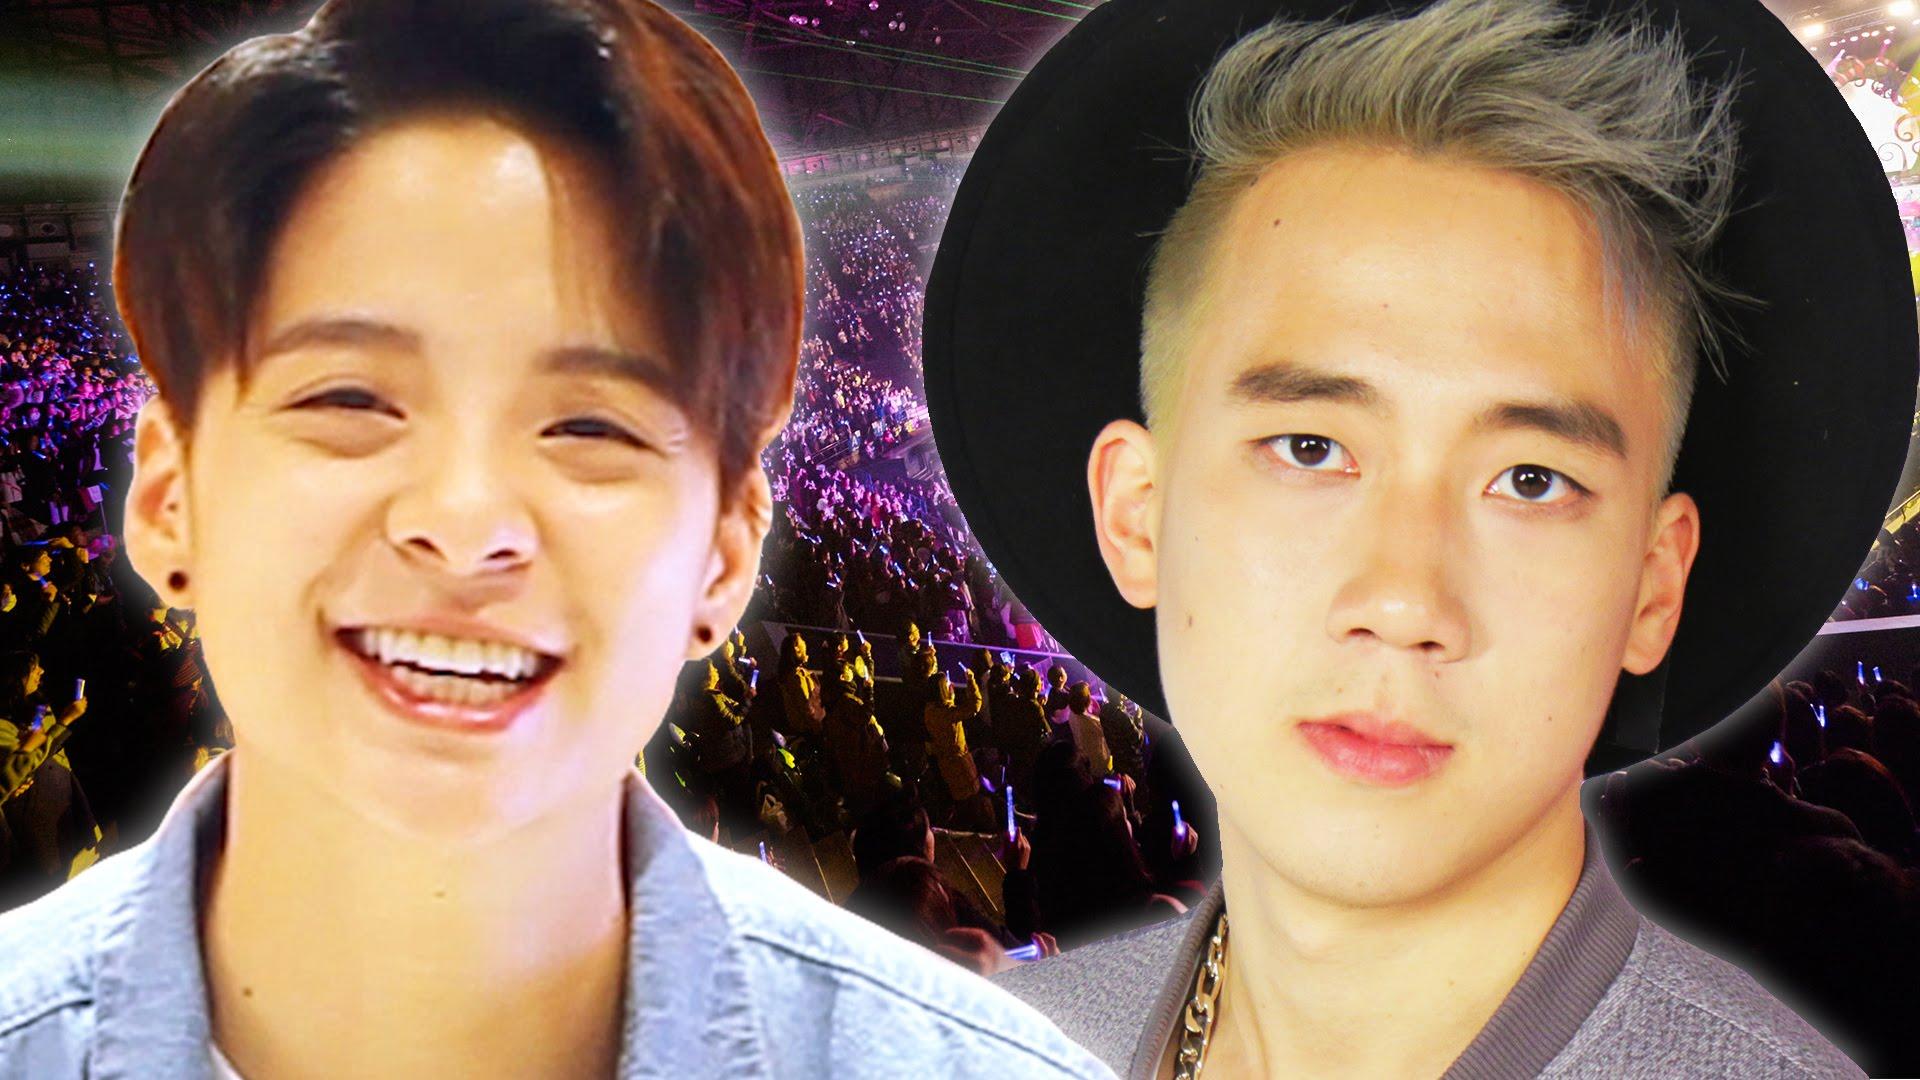 Buzzfeed's Steven Trains Like A K-Pop Star In Video Featuring Amber Liu